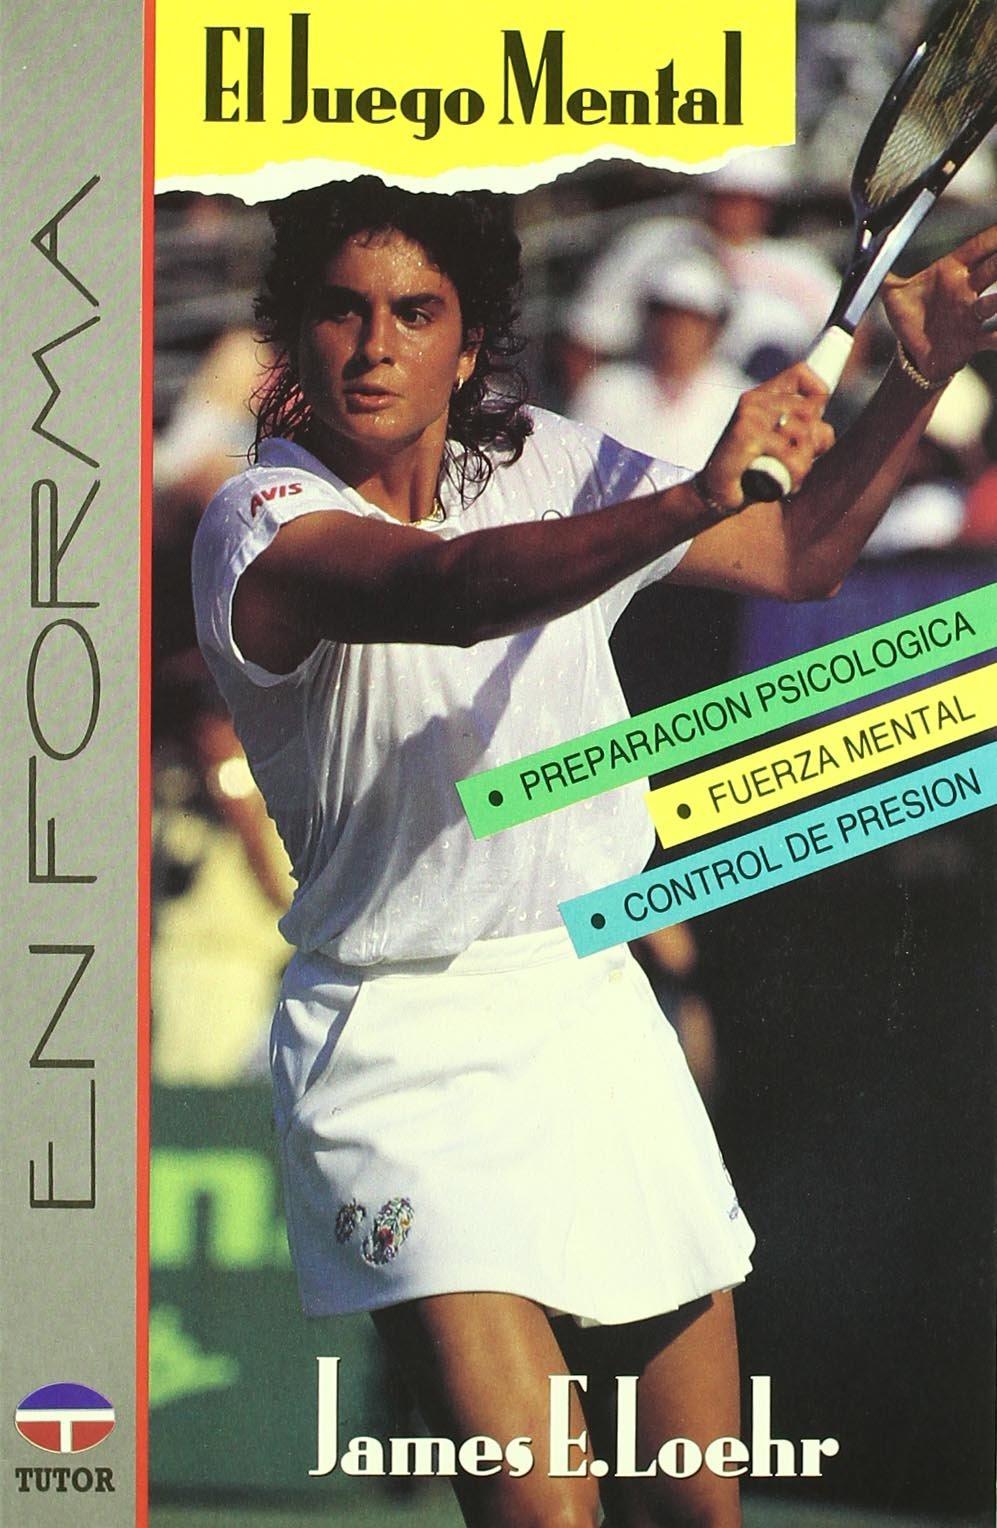 Juego Mental, El (Spanish Edition) (Spanish) Paperback – November, 1991